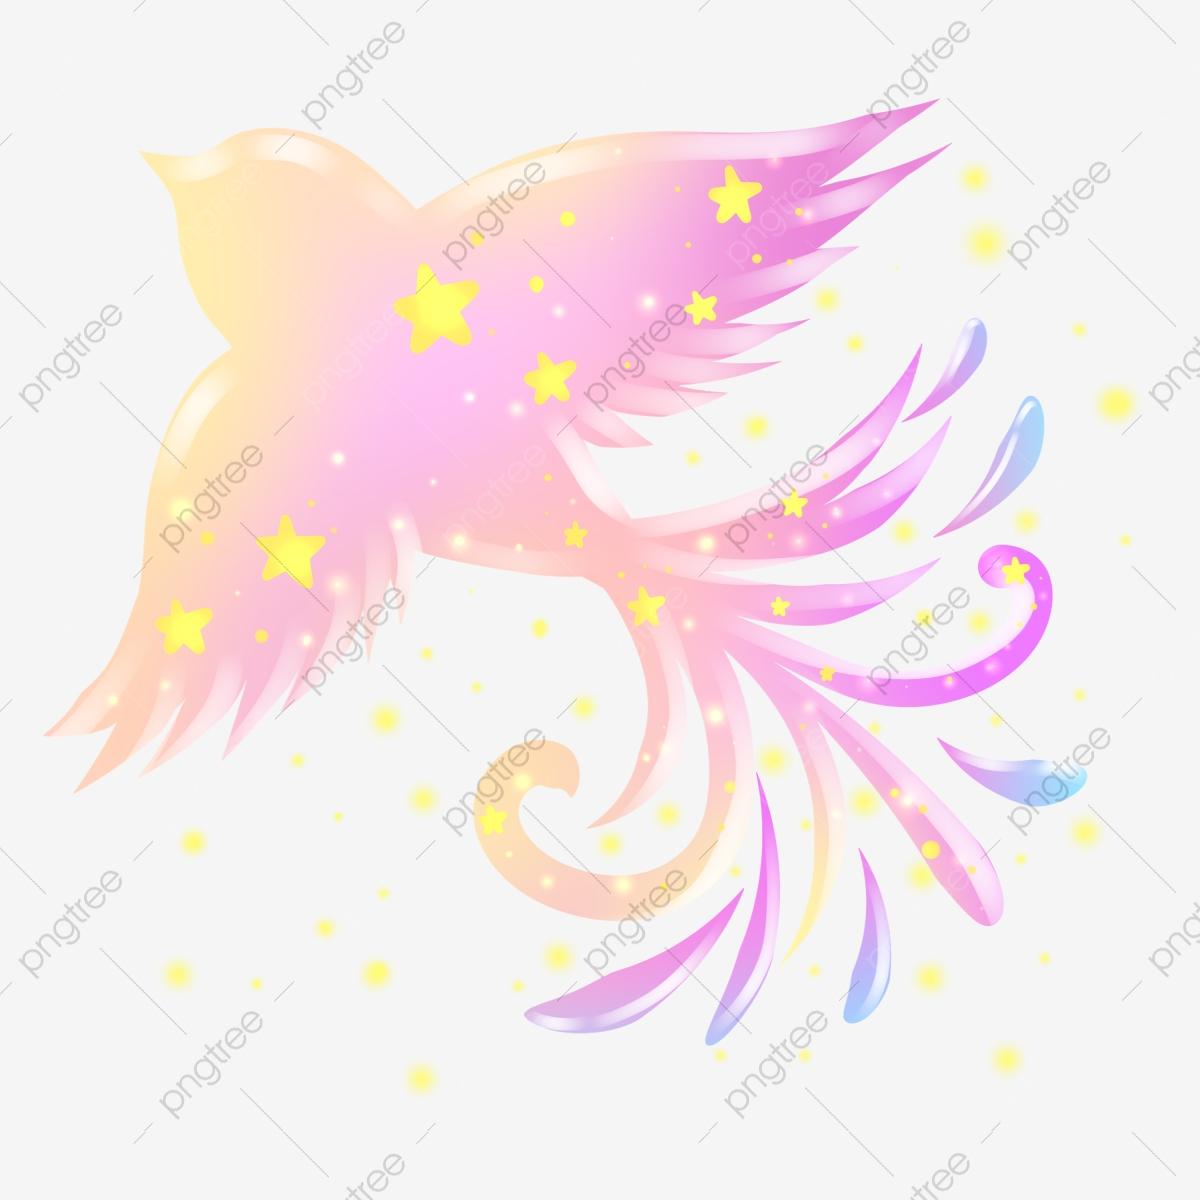 Oiseau Rose Oiseau Fantastique Oiseau En Vol Petit Animal concernant Vol Petit Oiseau